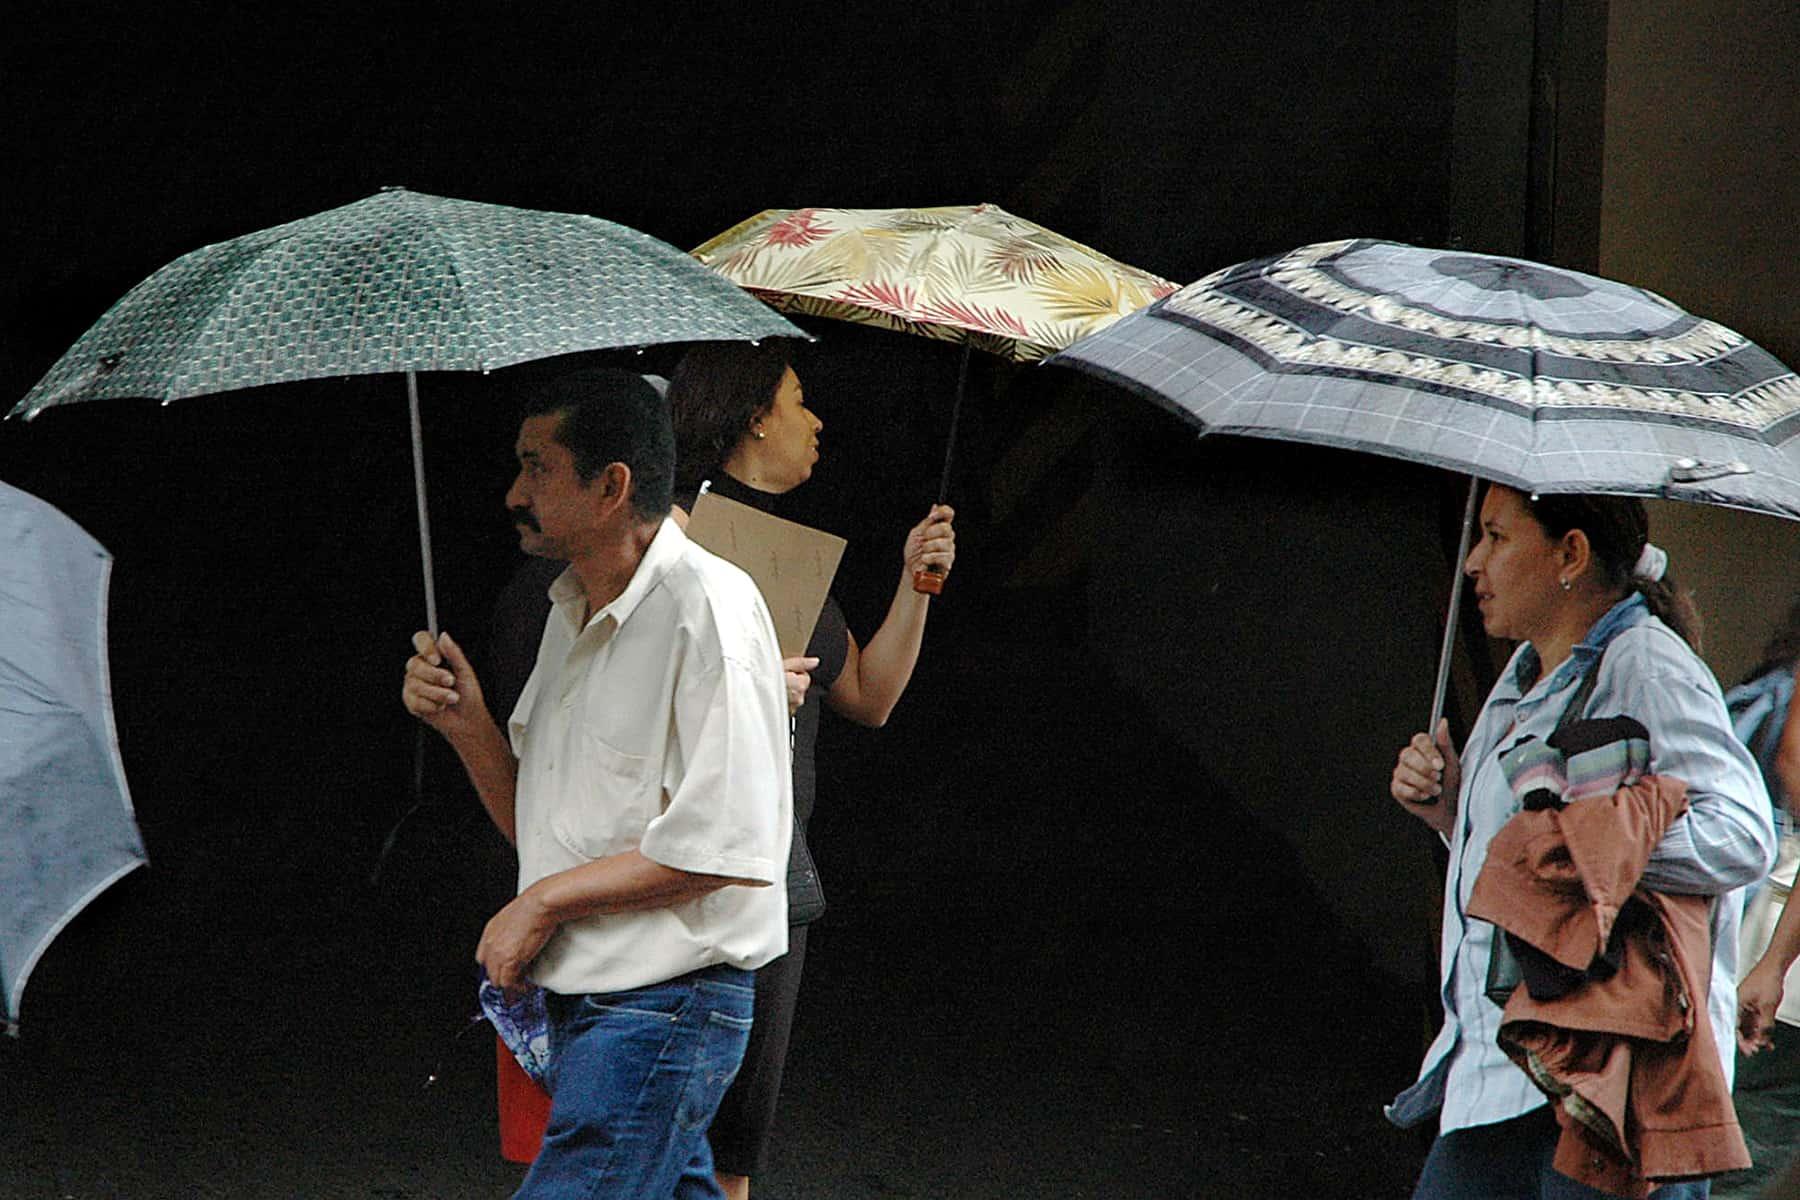 Rainy season in Costa Rica